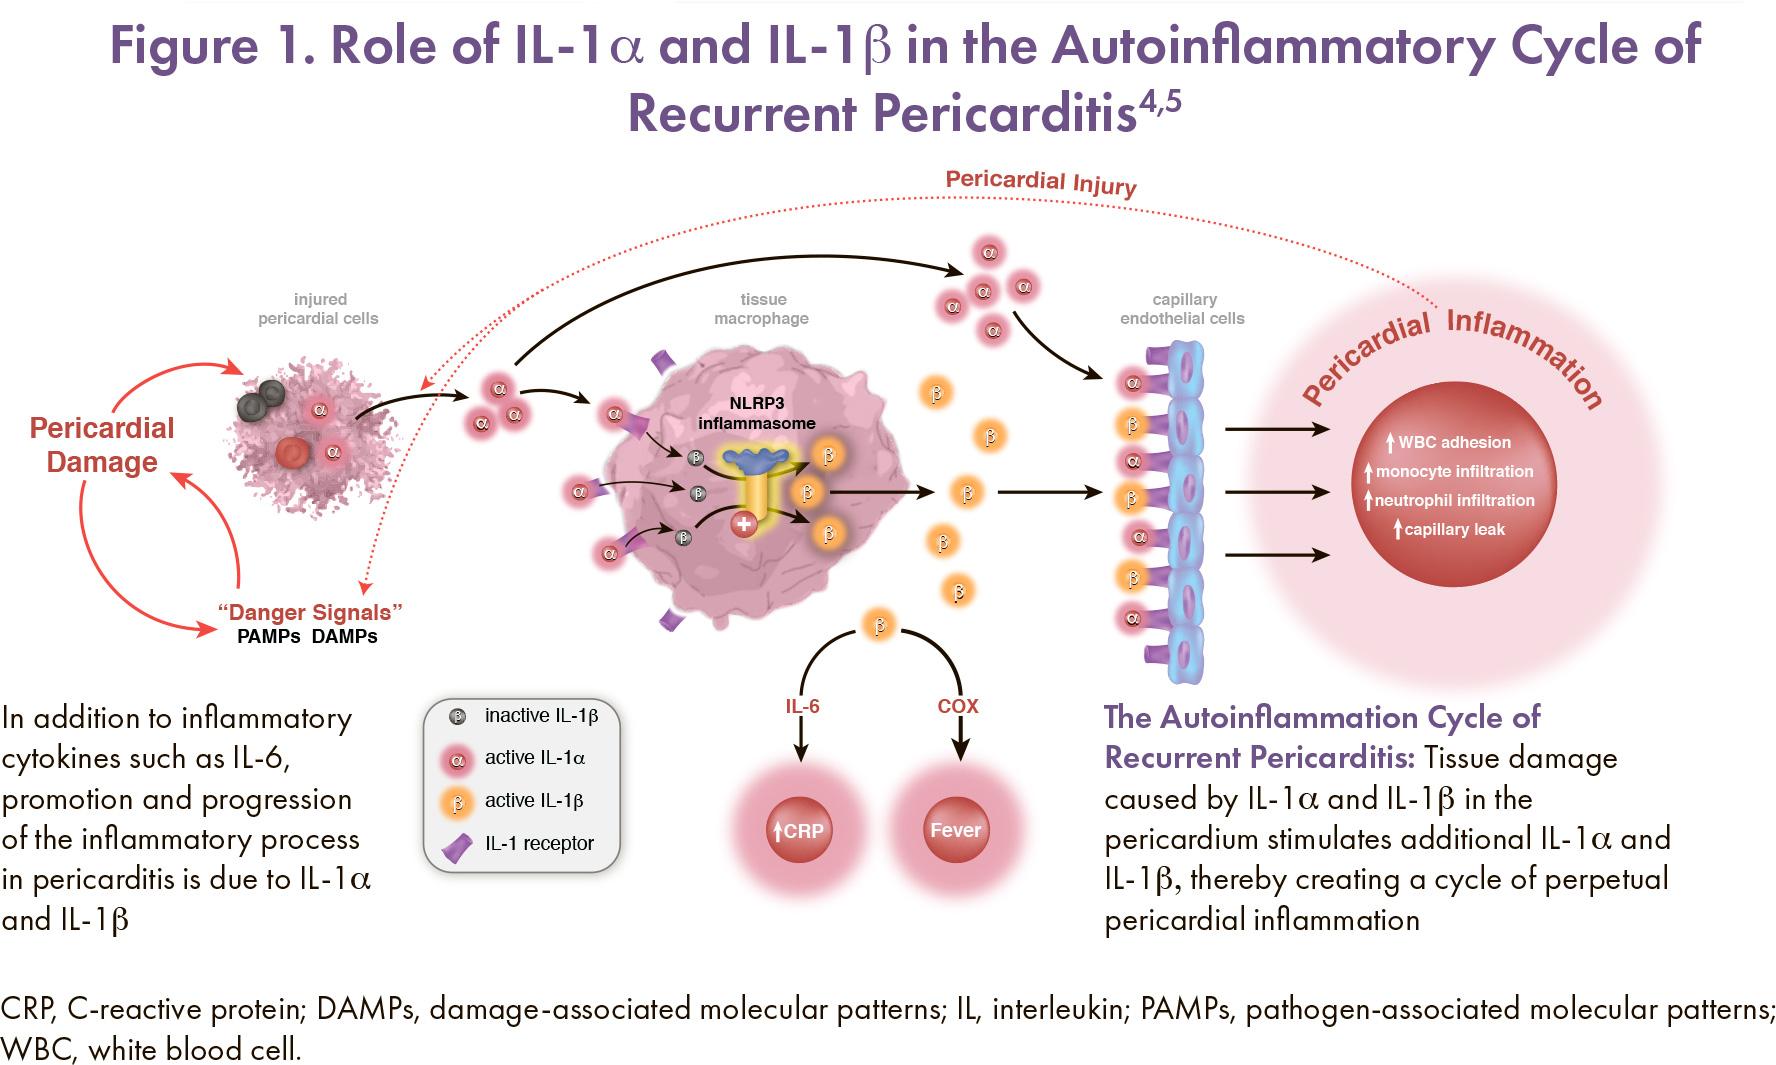 rilonacept moa 01 - Рилонацепт: первое лекарство против хронического перикардита